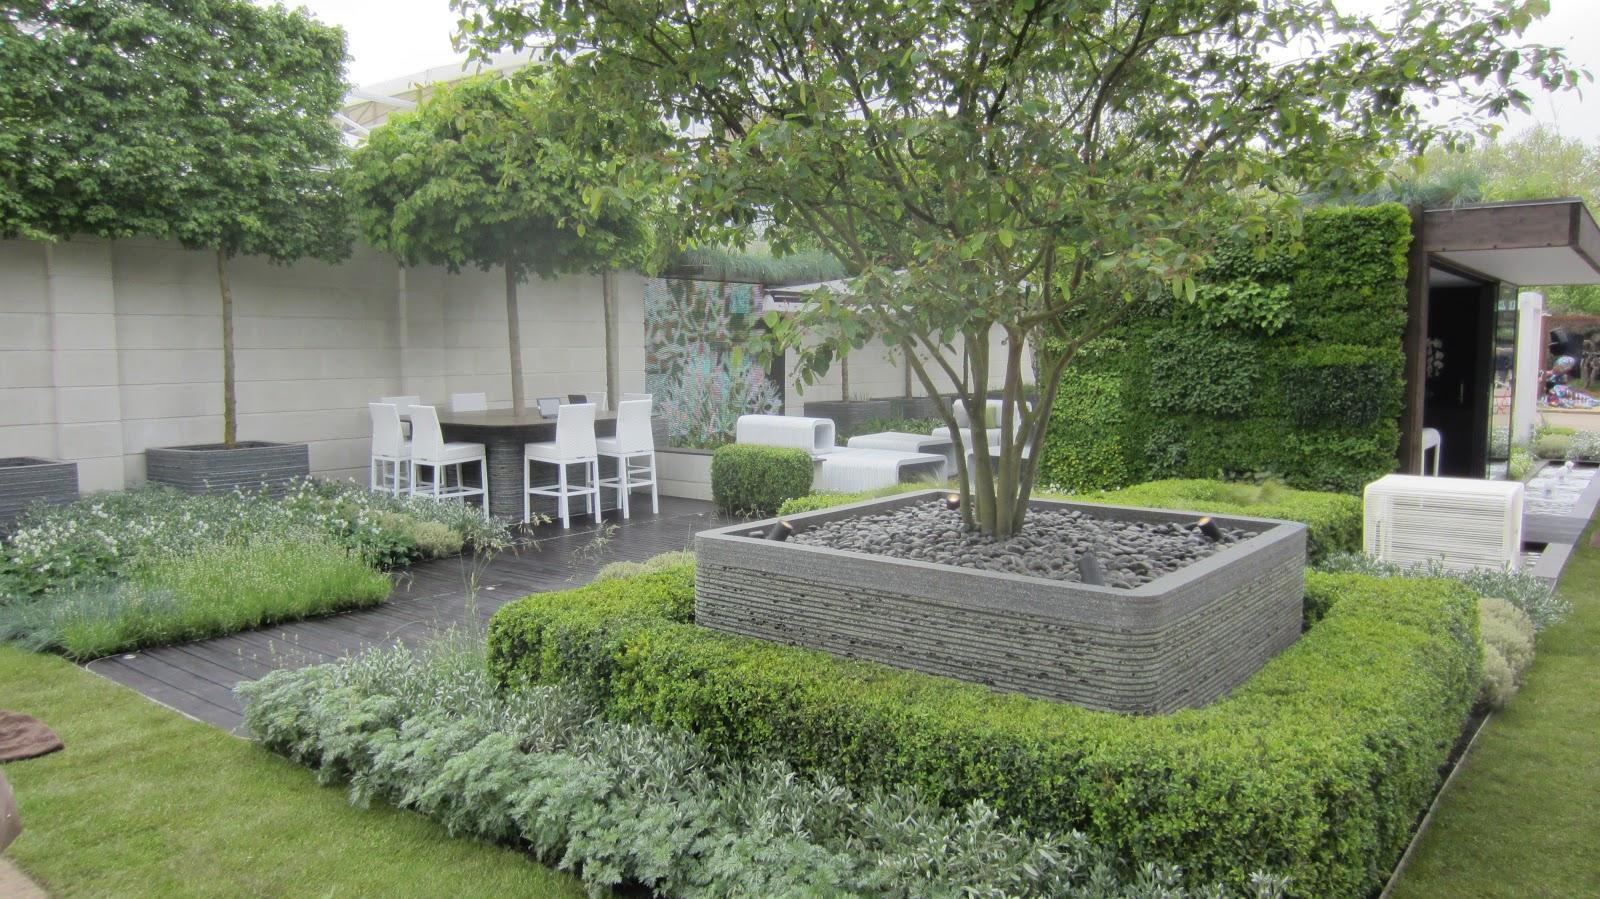 Garden Design John Brookes chelsea 2012 | john brookes raves & rants